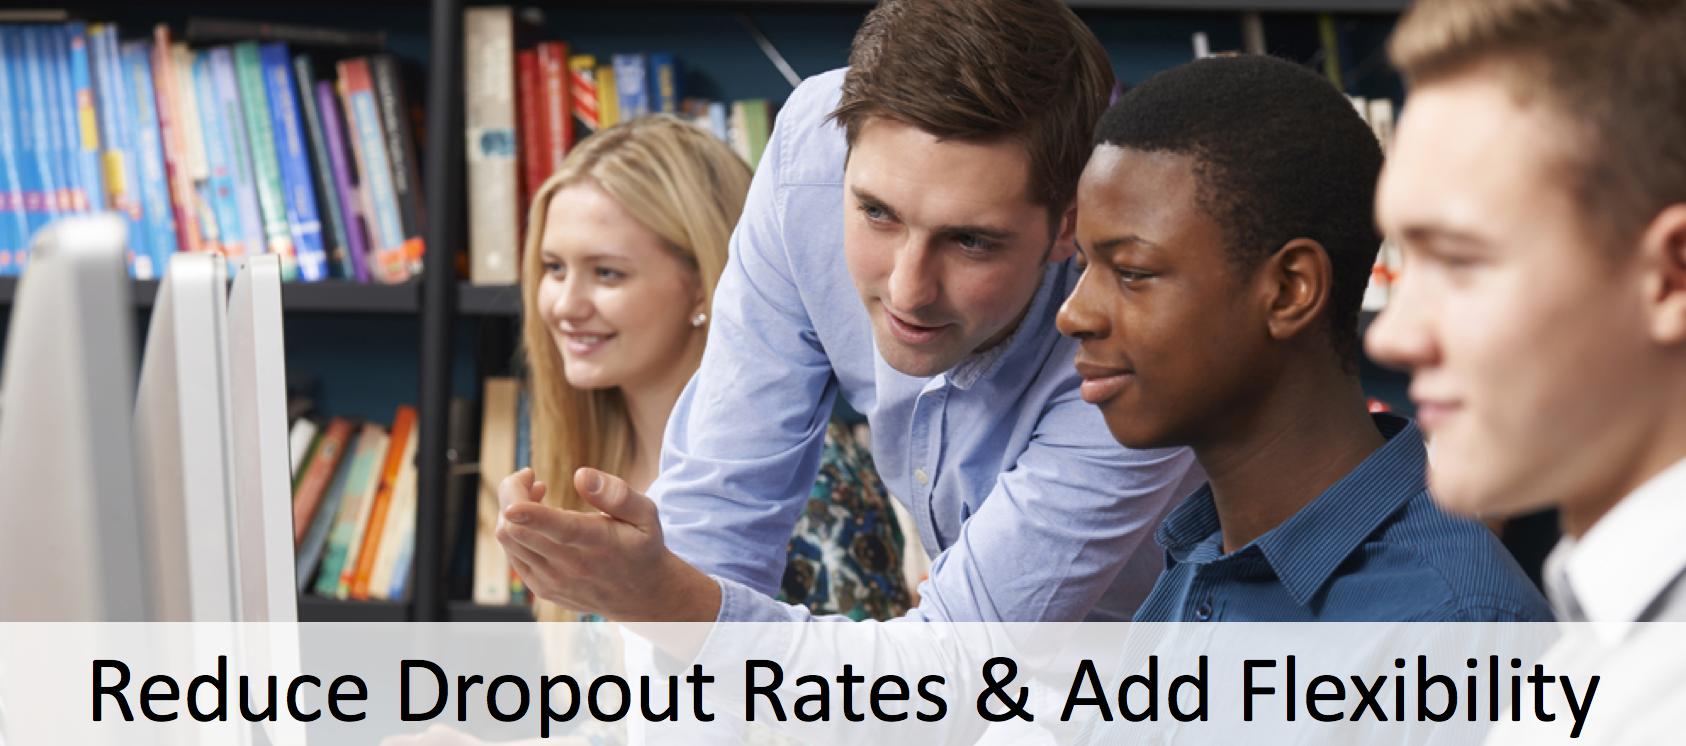 Reduce Dropout Rates Image